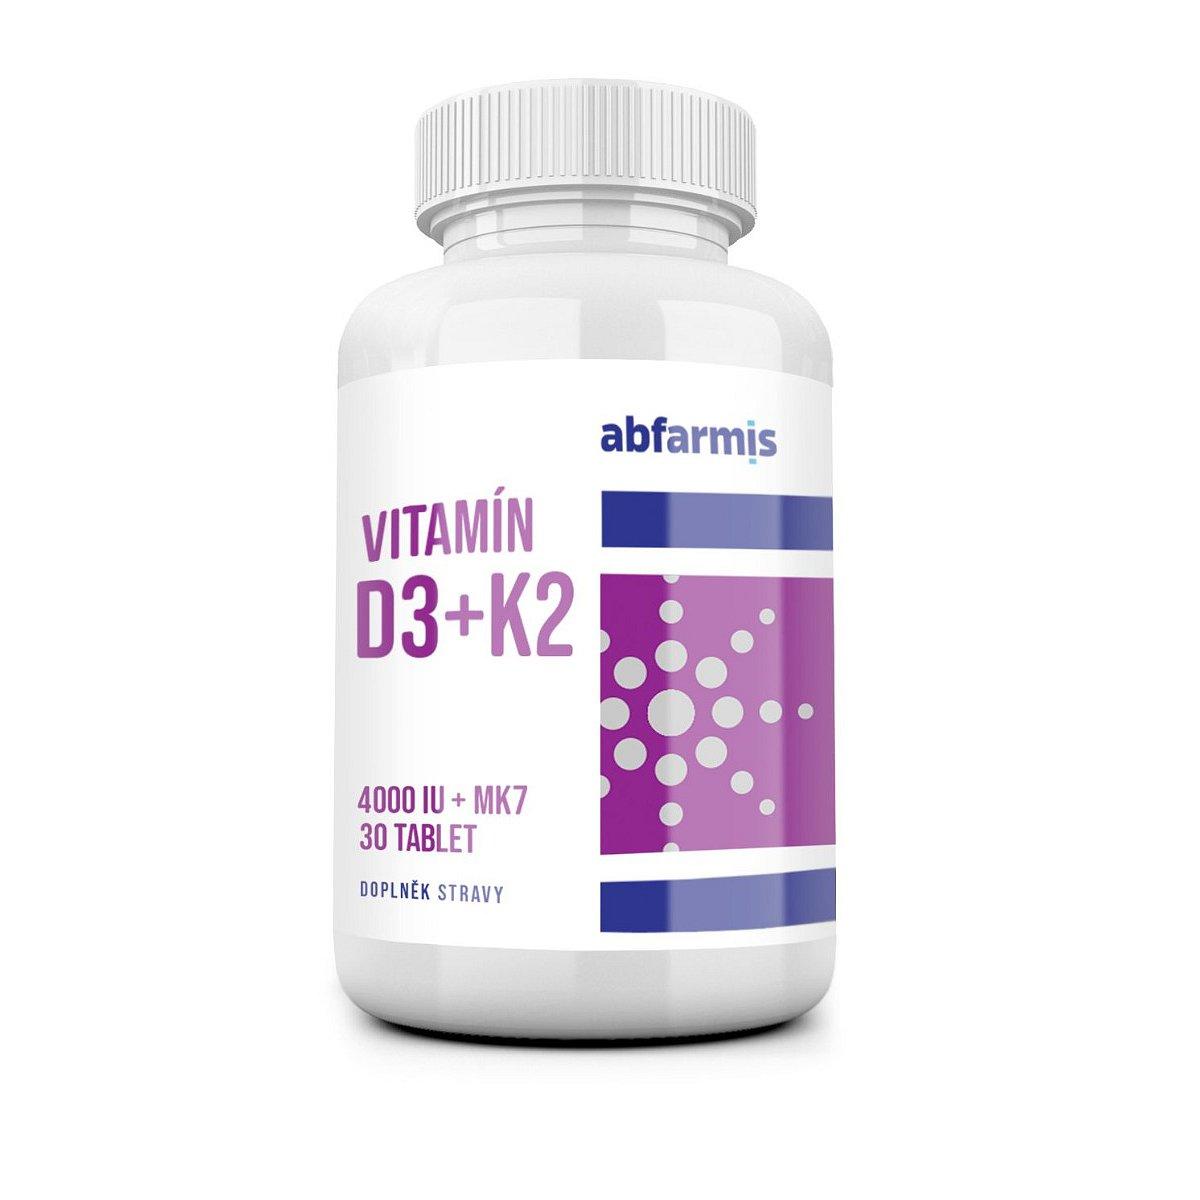 Abfarmis Vitamín D3 + K2 4000 IU + MK7 30 tablet